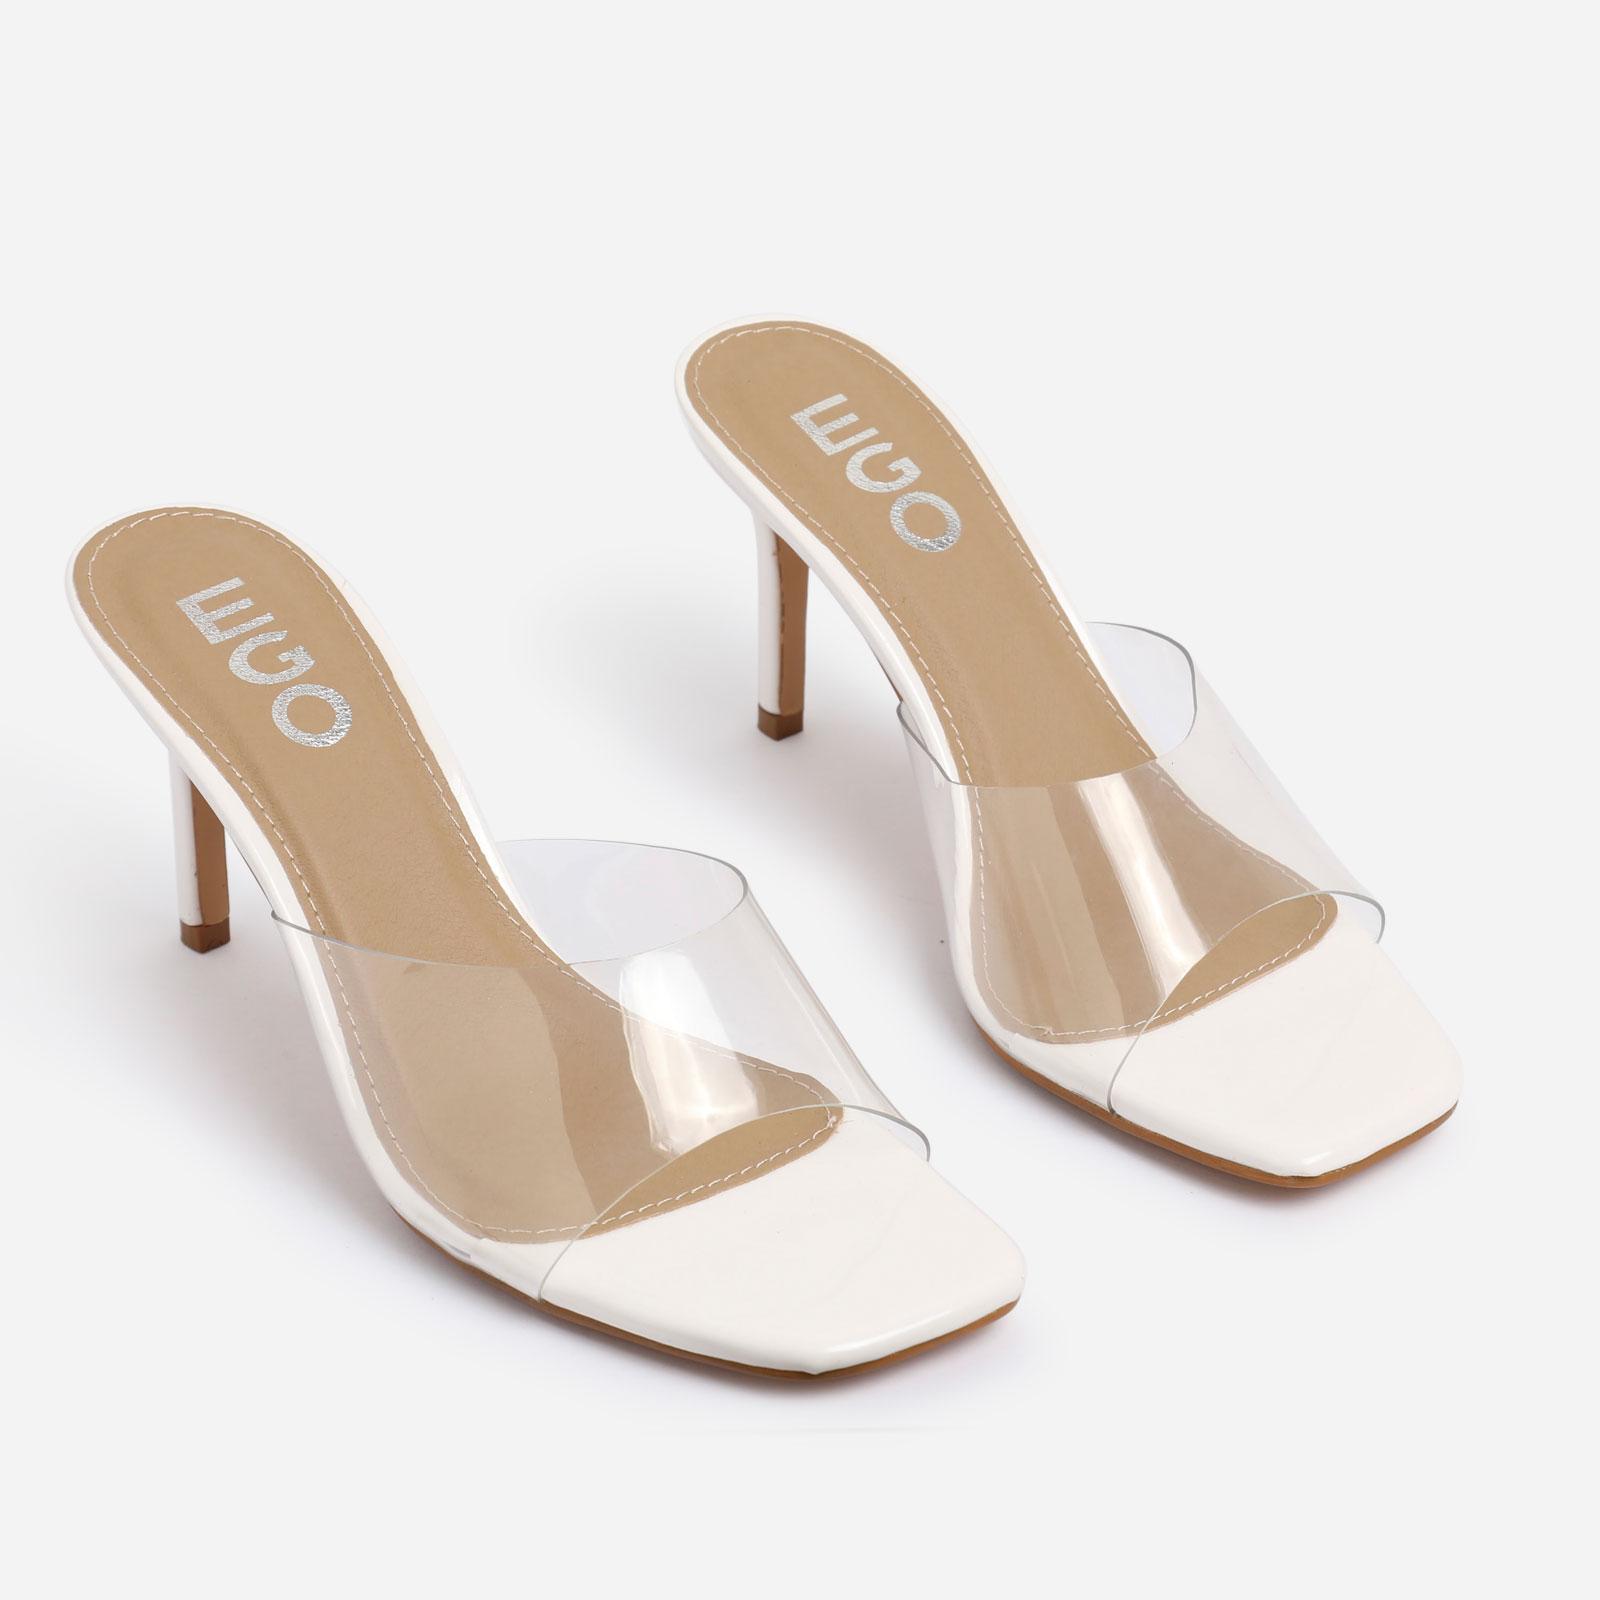 Rexa Square Peep Toe Perspex Kitten Heel Mule In White Patent